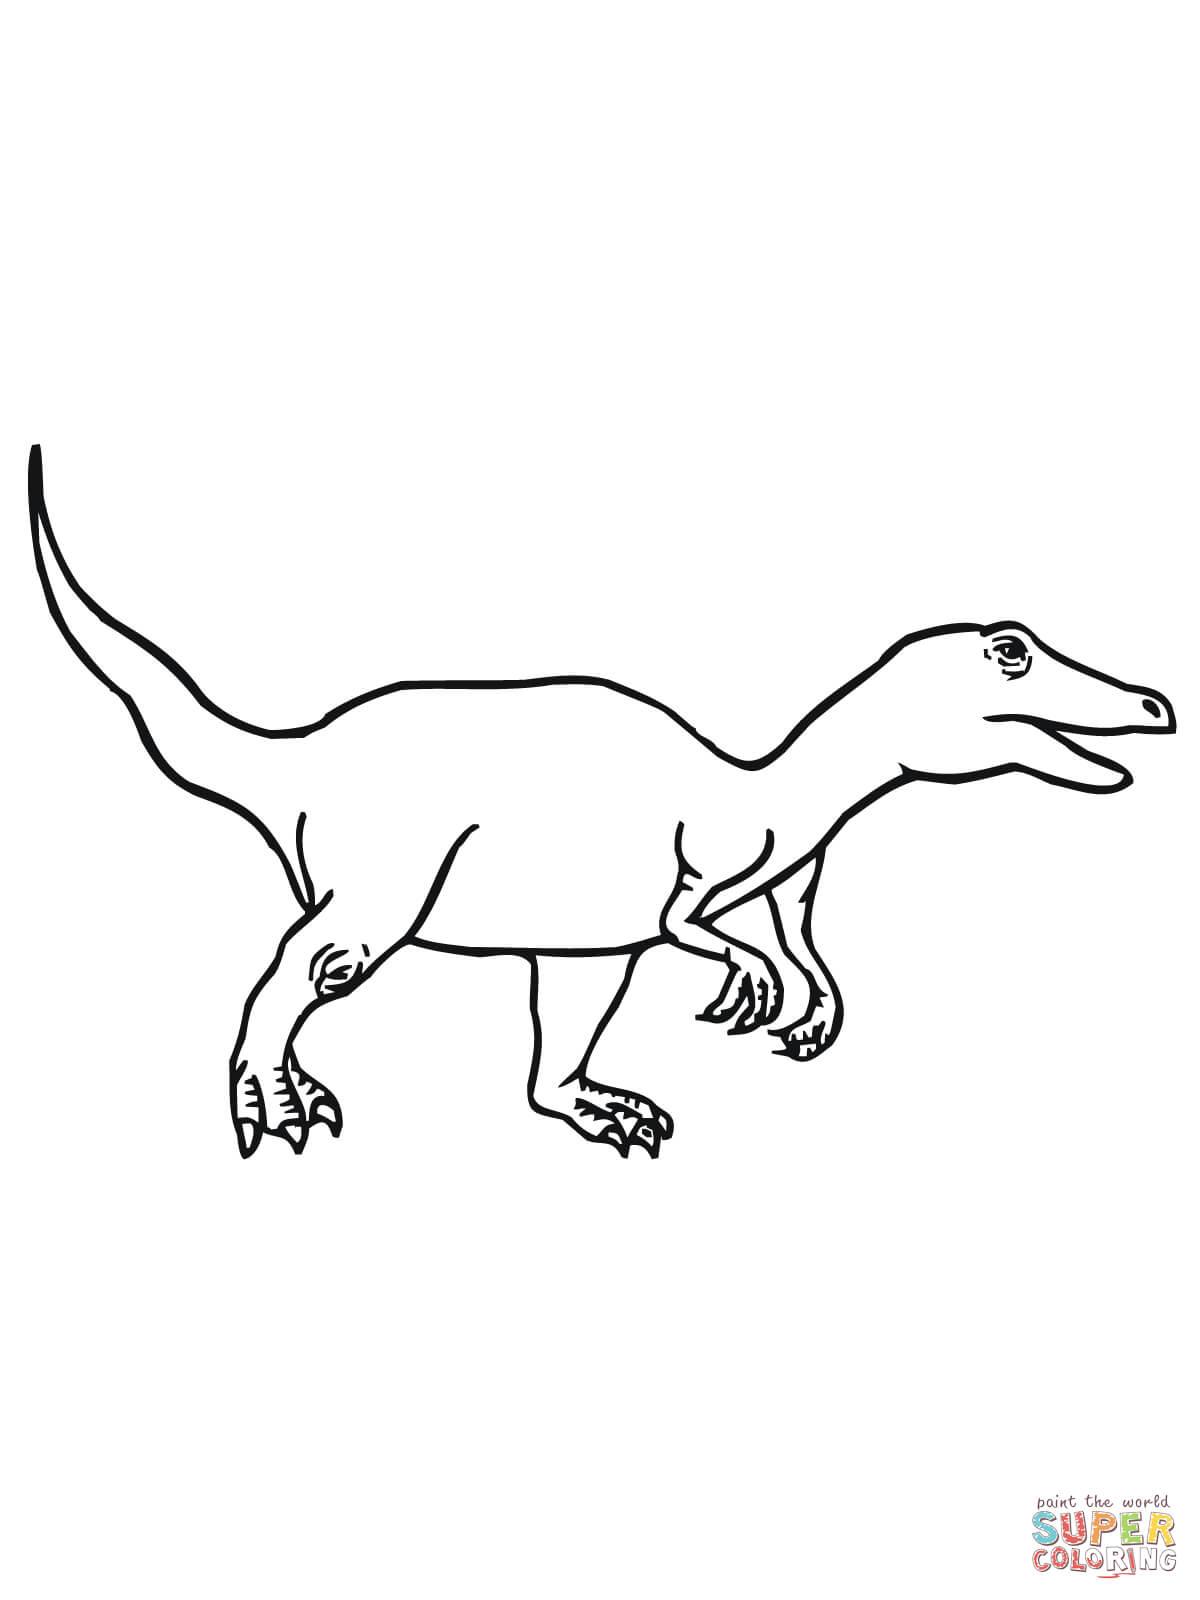 1200x1600 Velociraptor Dromaeosaurid Theropod Dinosaur Coloring Page Free